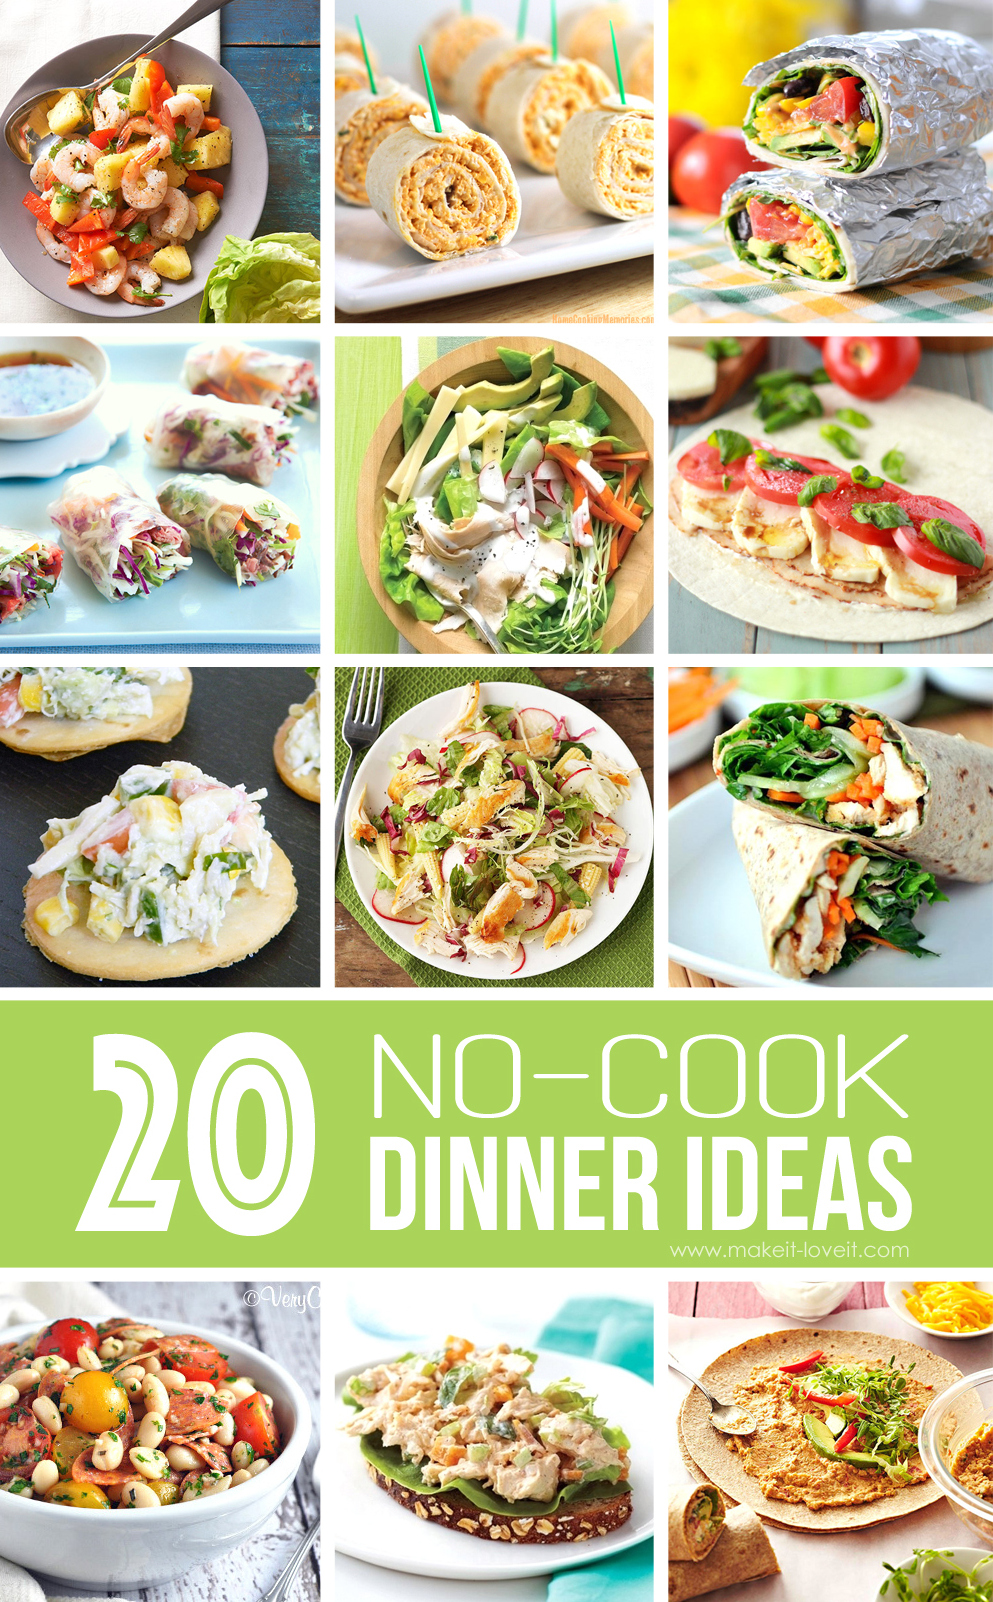 20-no-cook-dinner-ideas